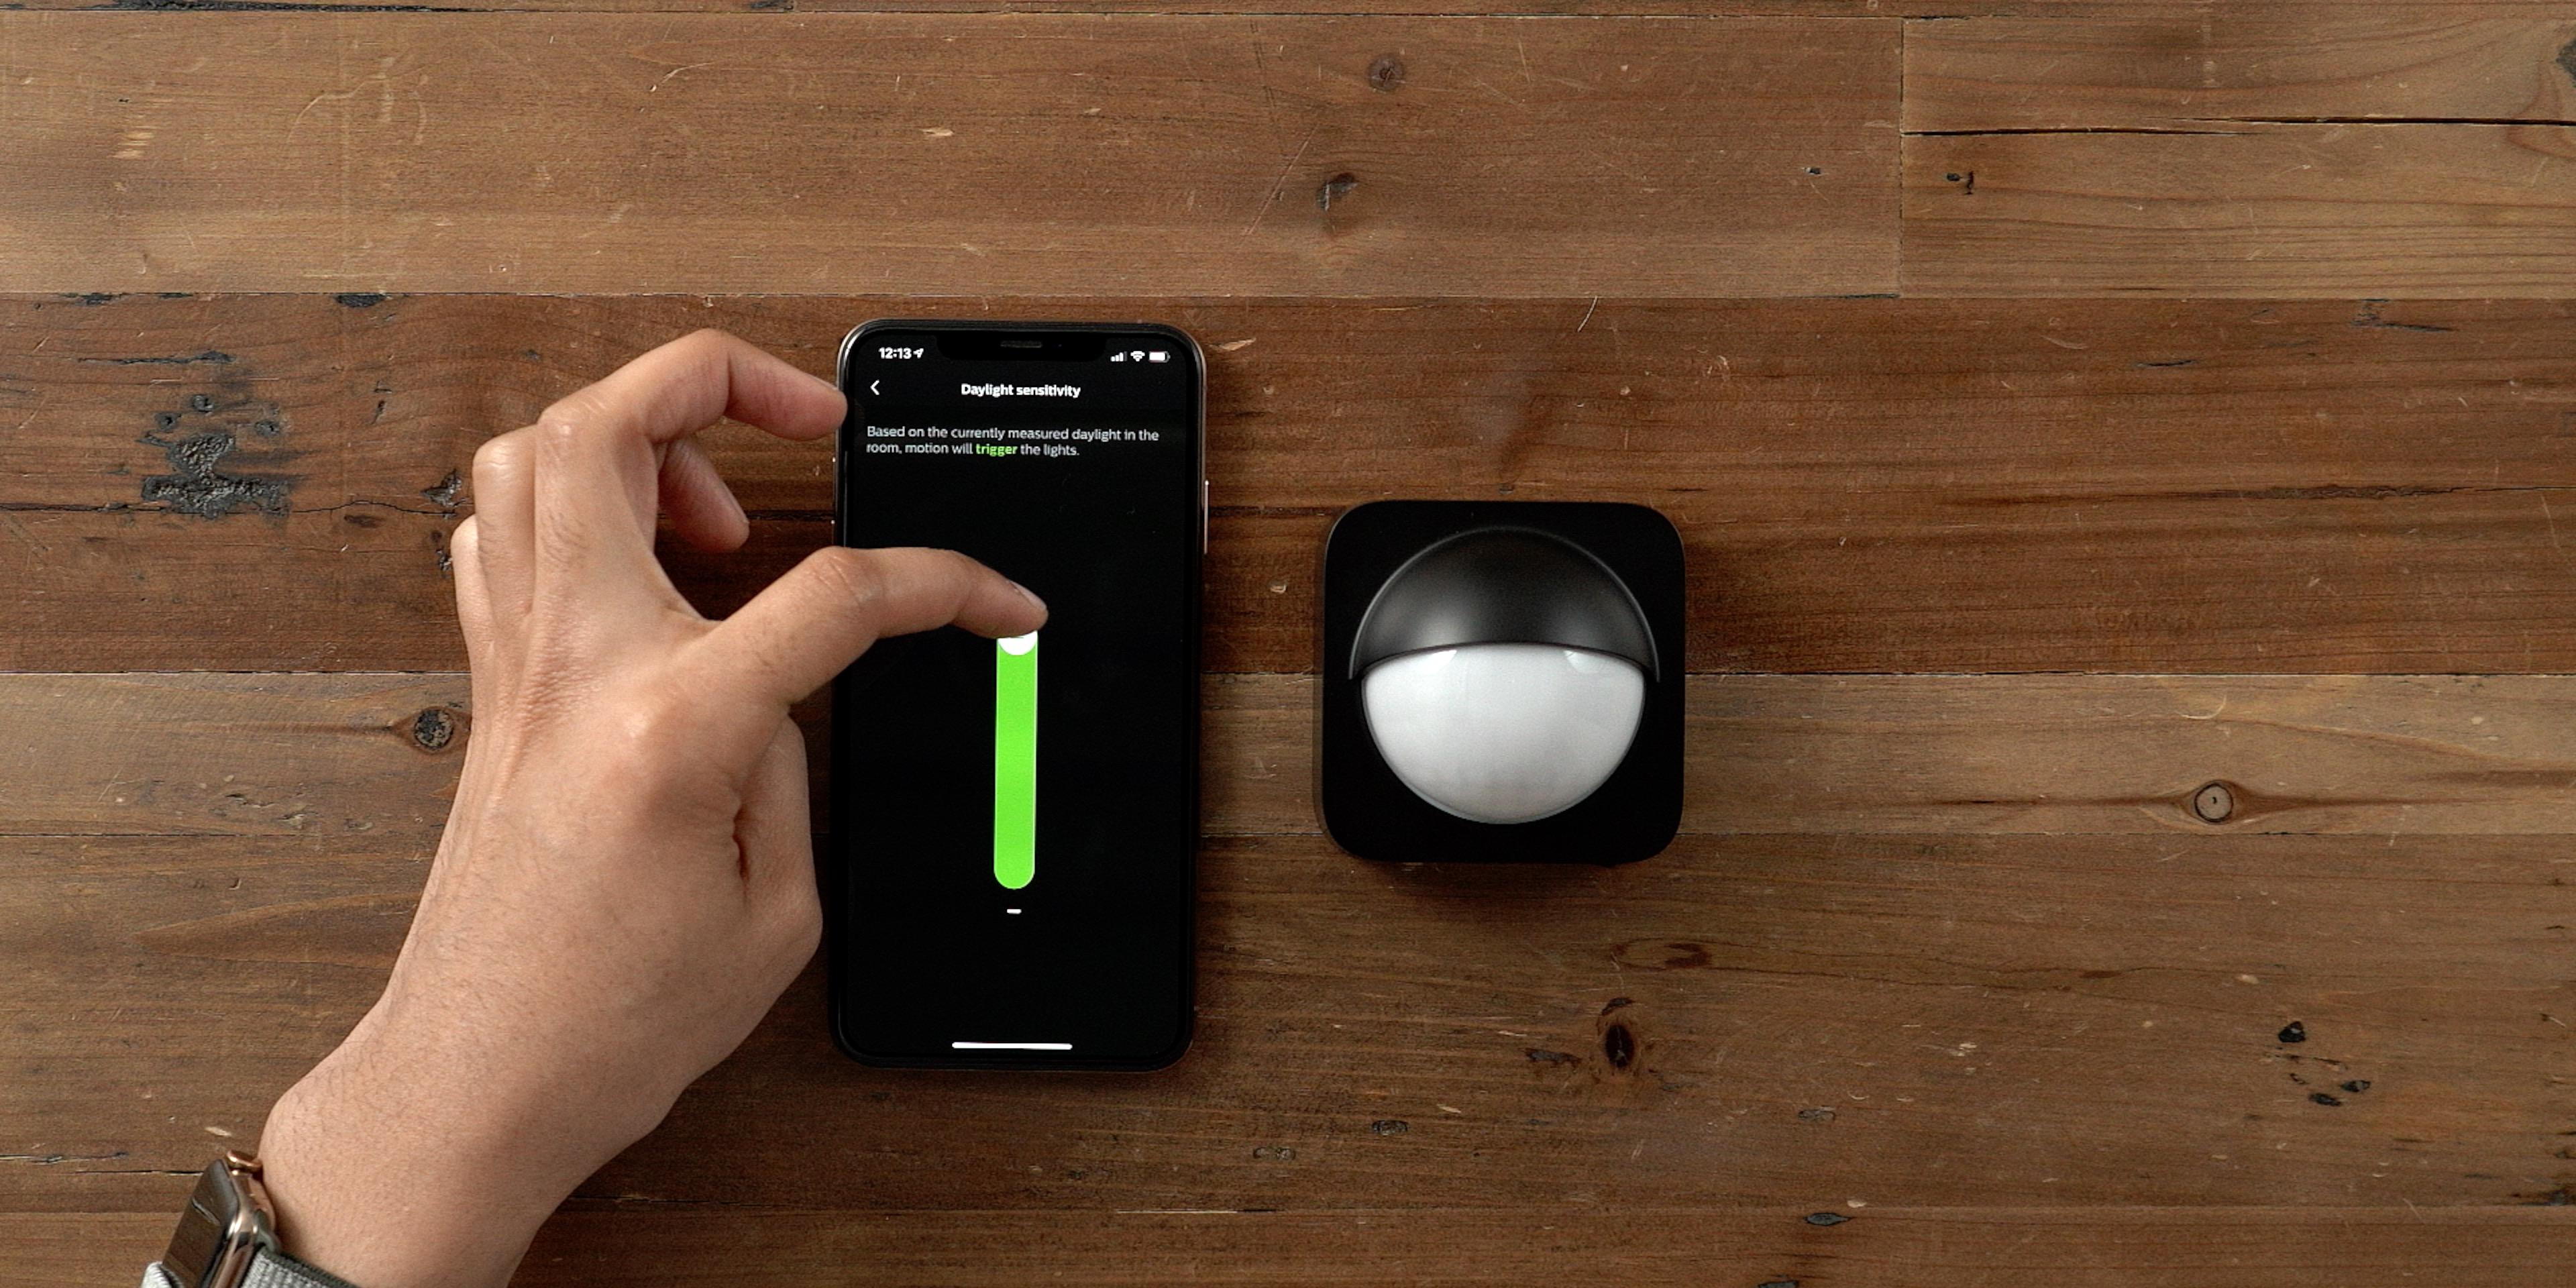 Hands On Philips Hue Outdoor Sensor An Ideal Smart Home